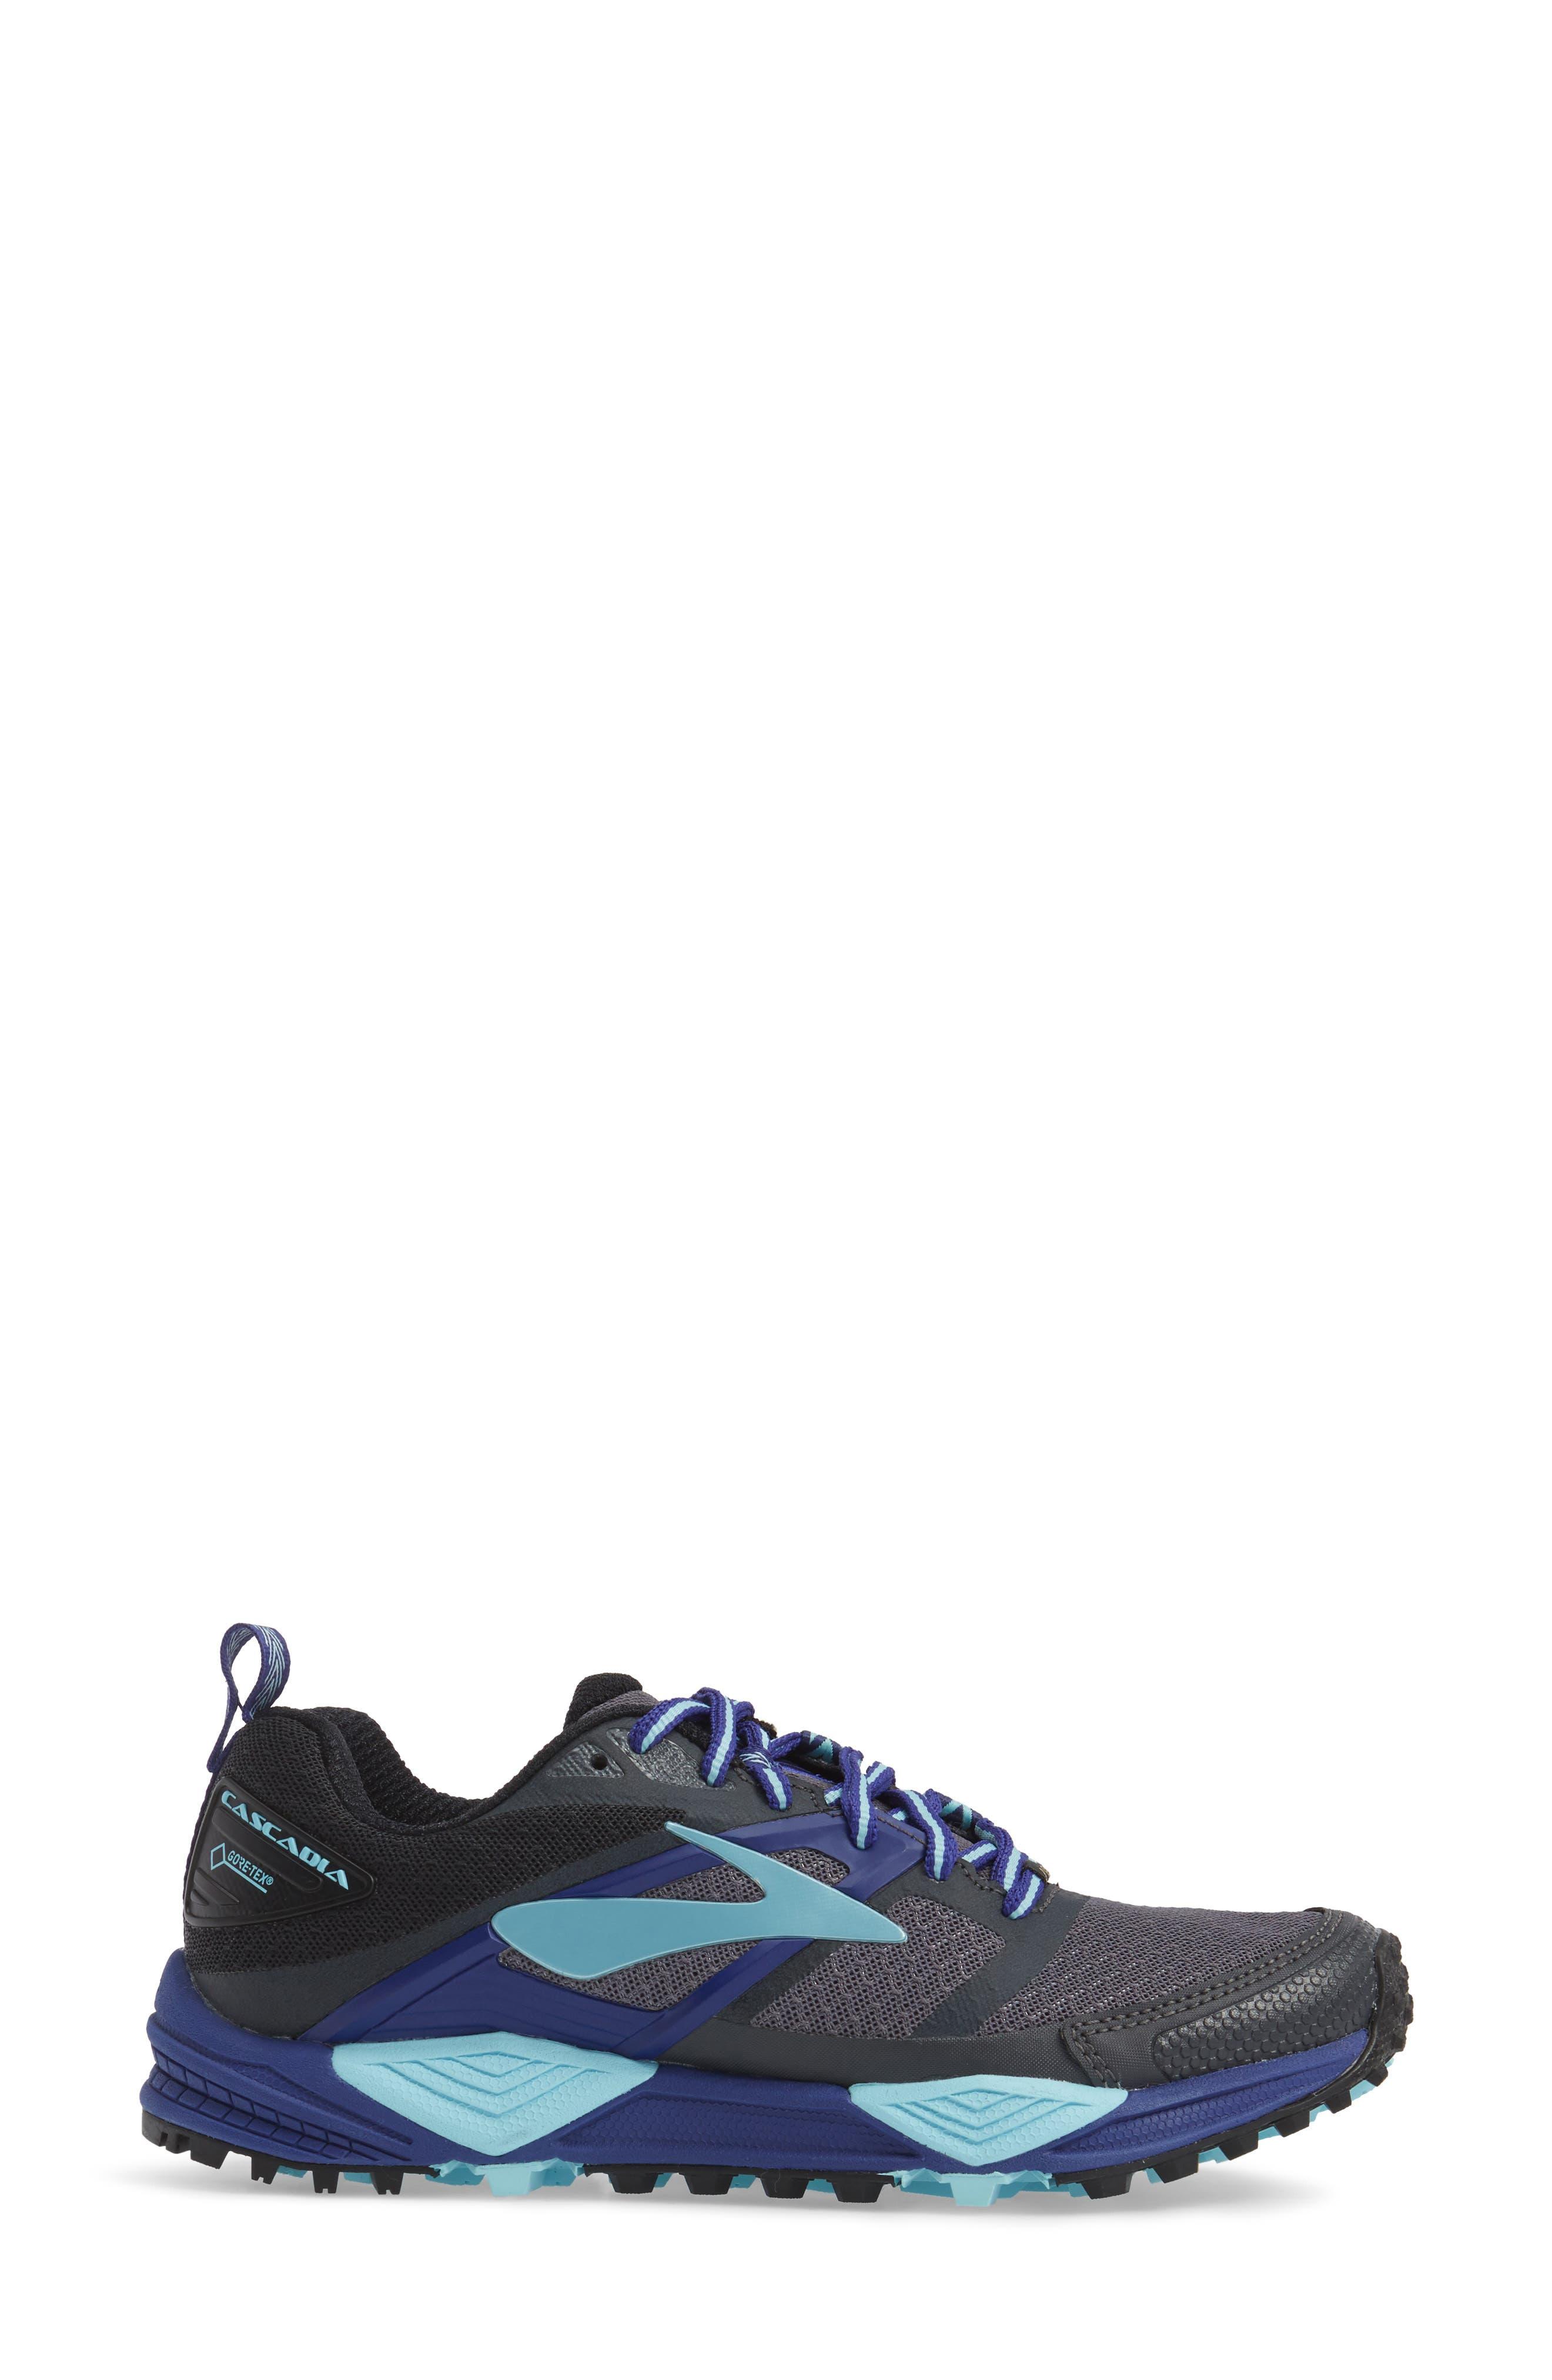 Cascadia 12 GTX Trail Running Shoe,                             Alternate thumbnail 3, color,                             Black/ Ebony/ Clematis Blue